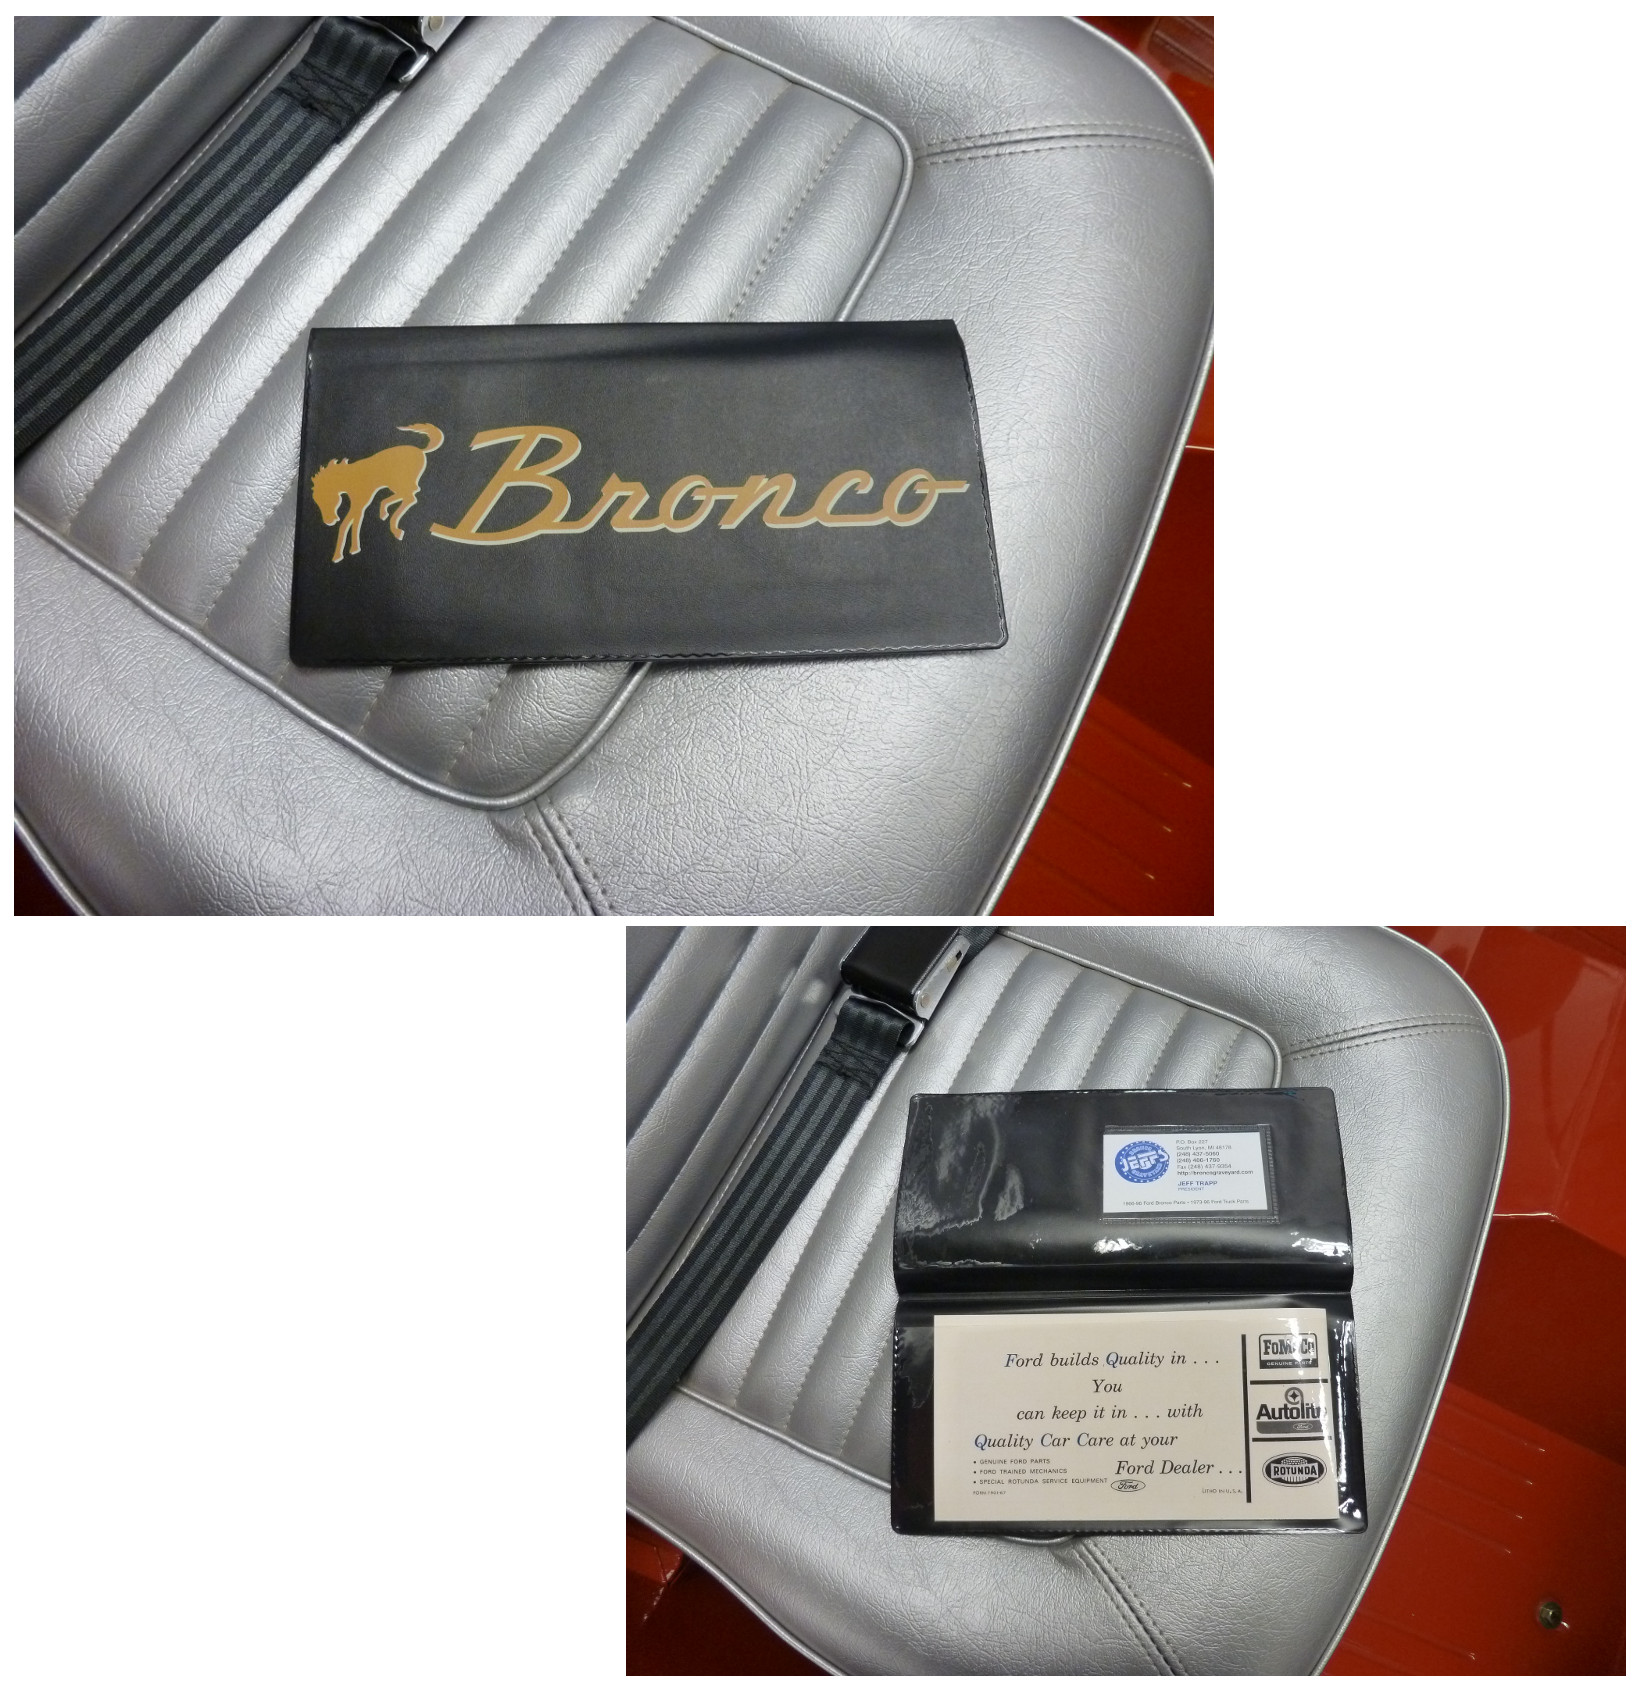 bronco owners manual wallet   broncograveyardcom